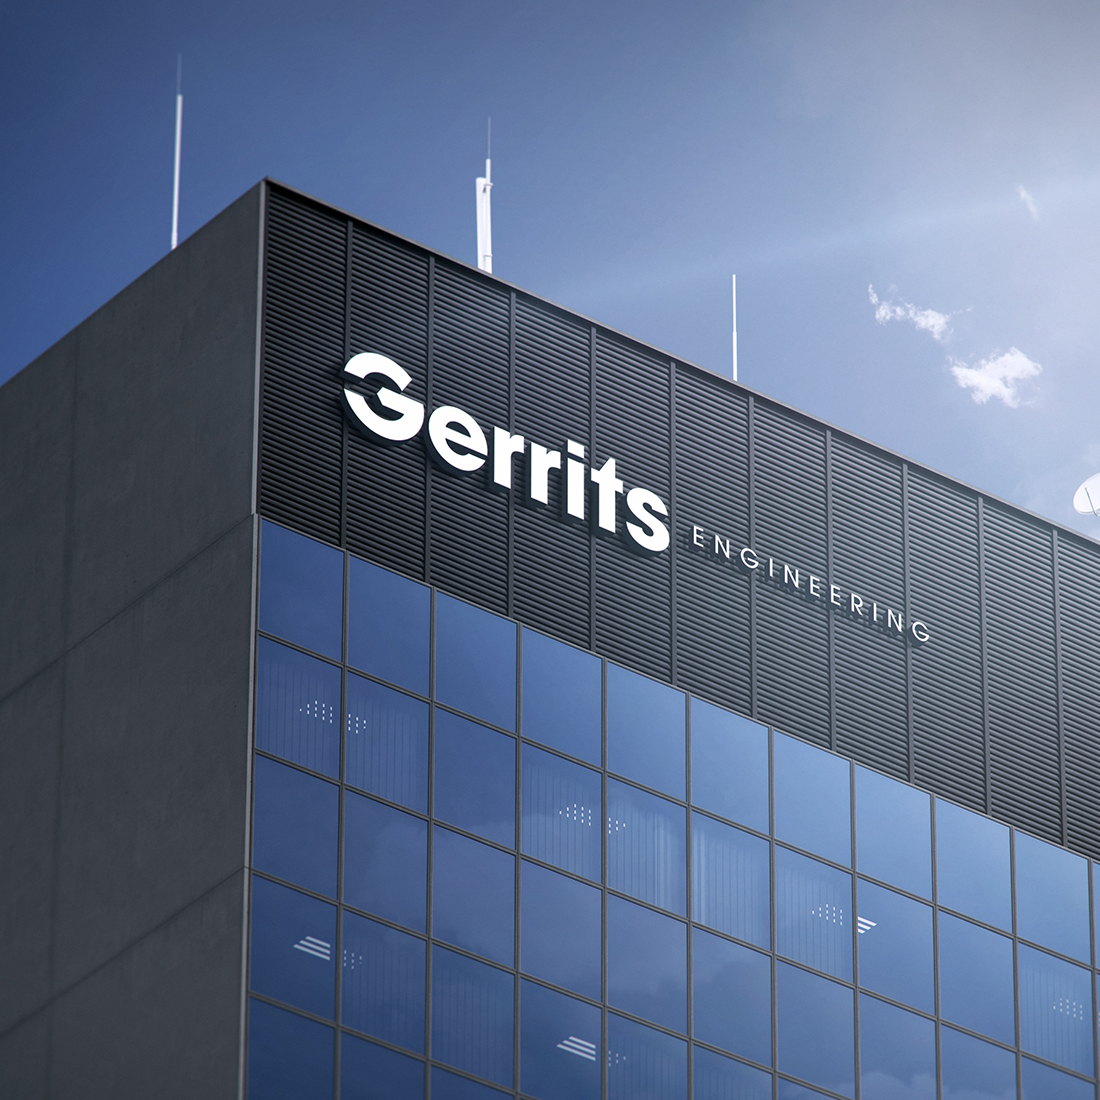 gerrits engineering building signage branding case study tile